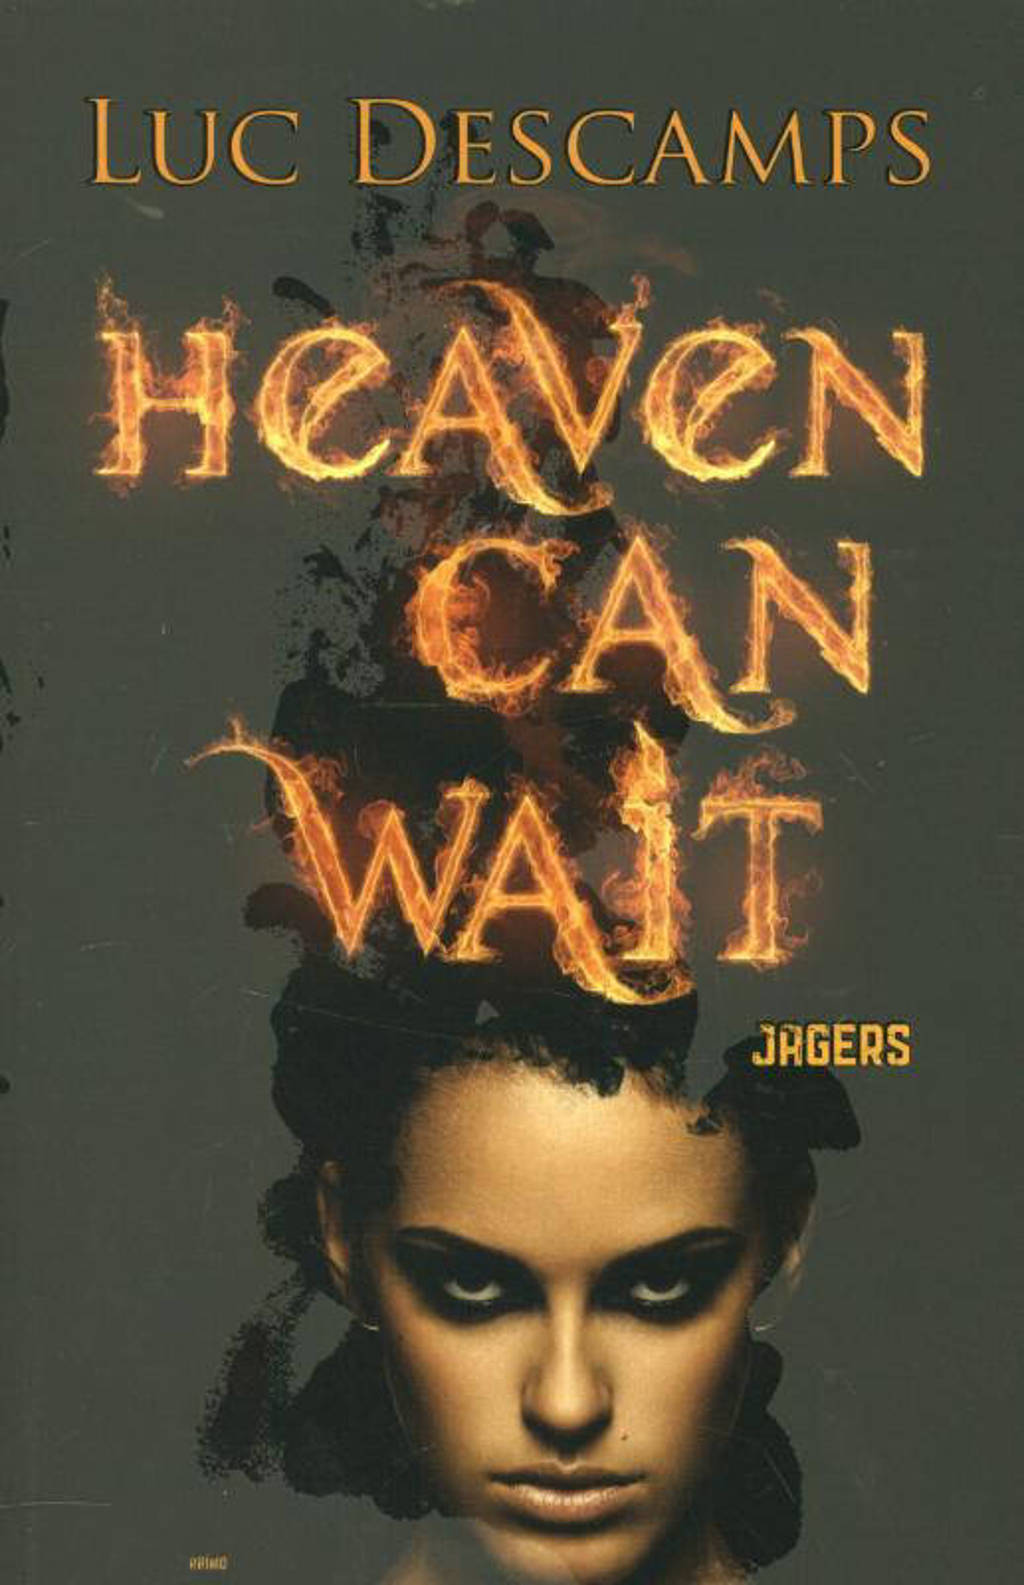 Heaven can wait: Jagers - Luc Descamps